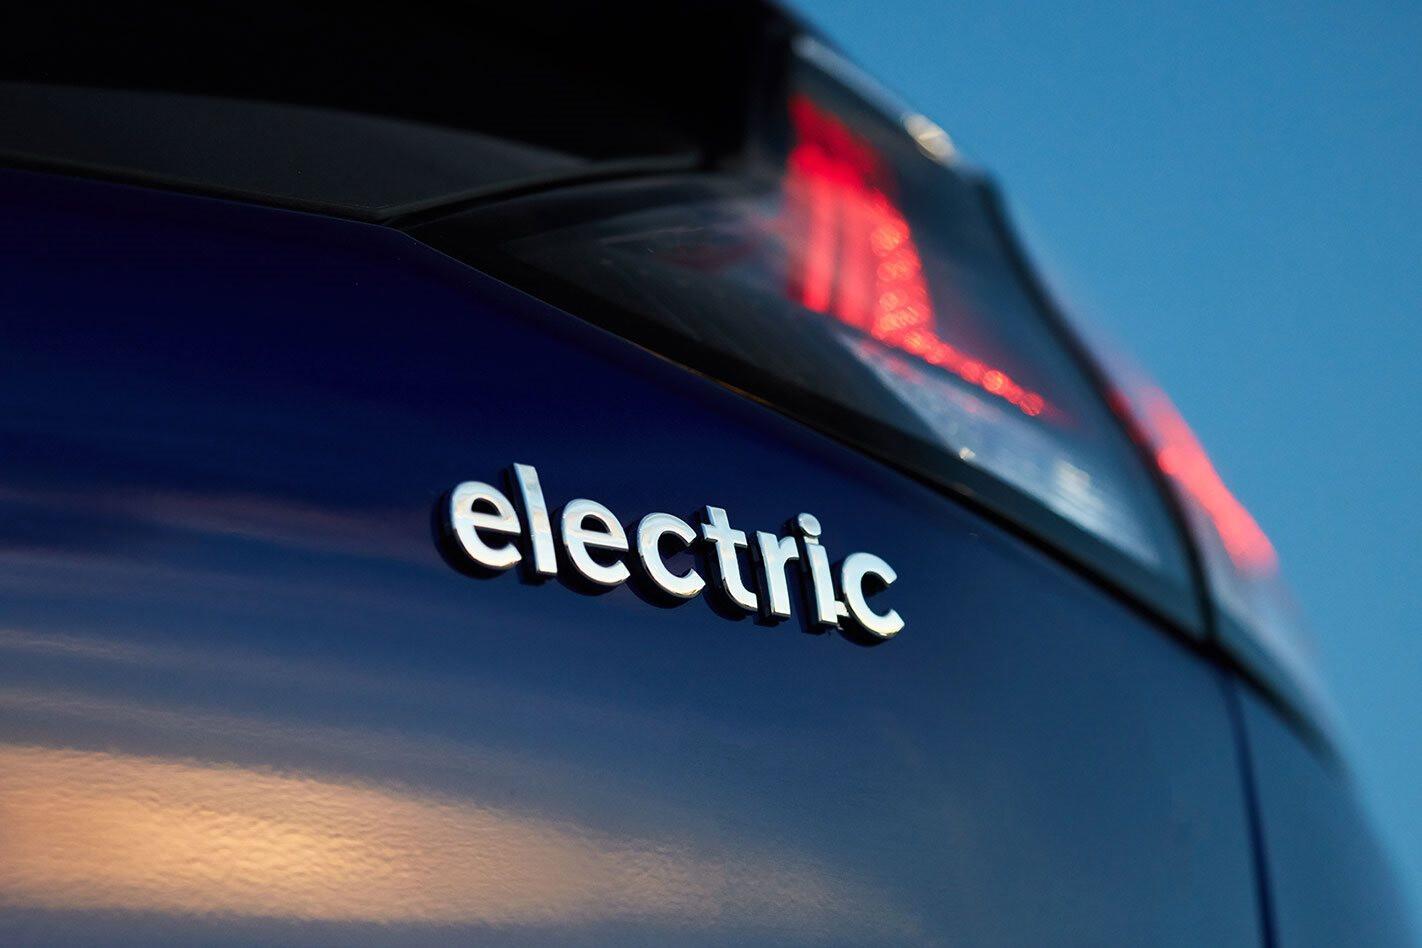 Electric vehicle badge